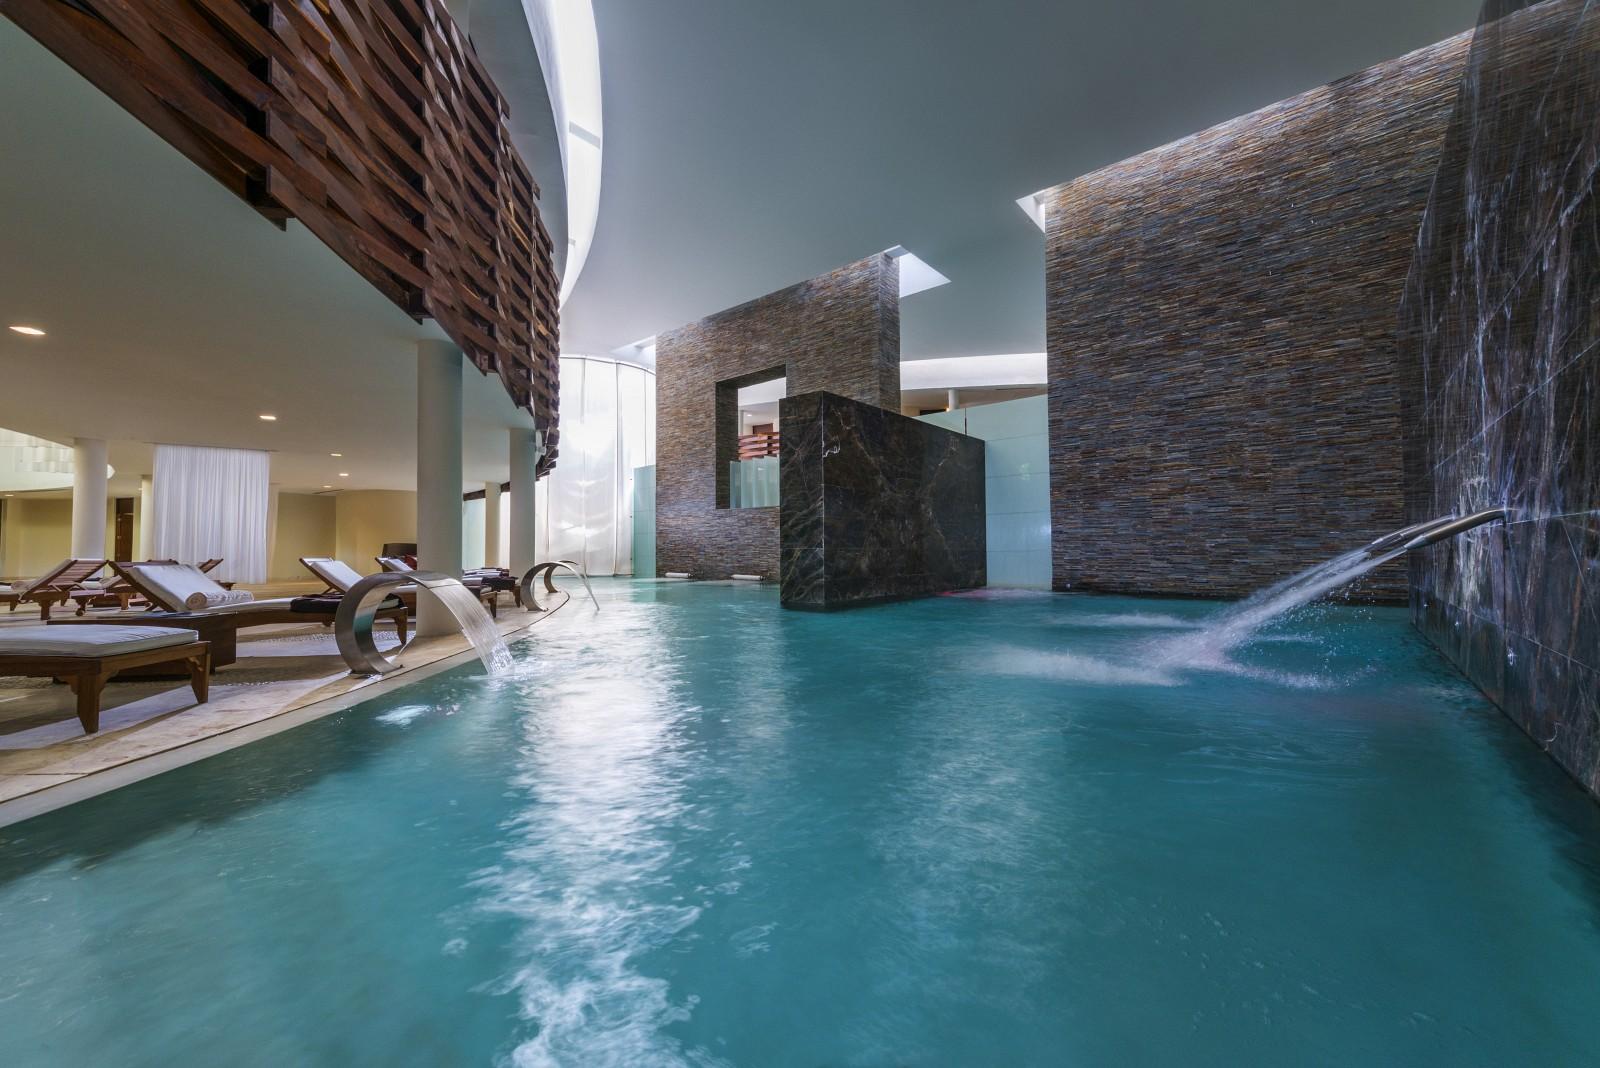 Travel Agency All-Inclusive Resort Grand Velas Riviera Maya 089